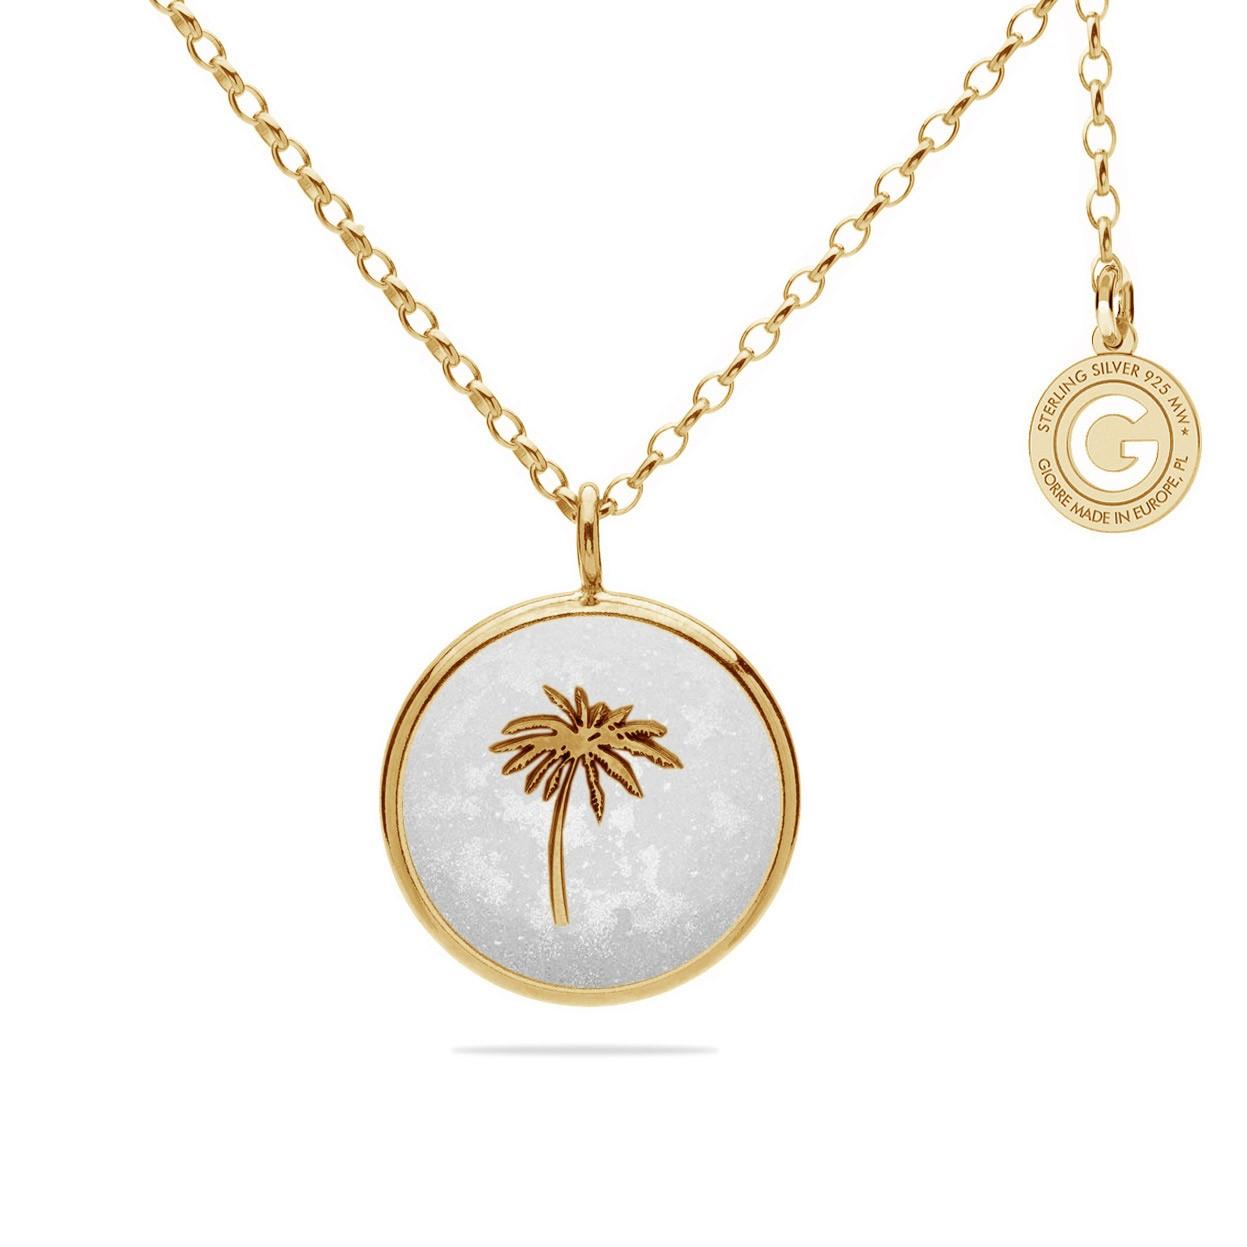 Srebrny medalion palma i biała żywica, srebro 925